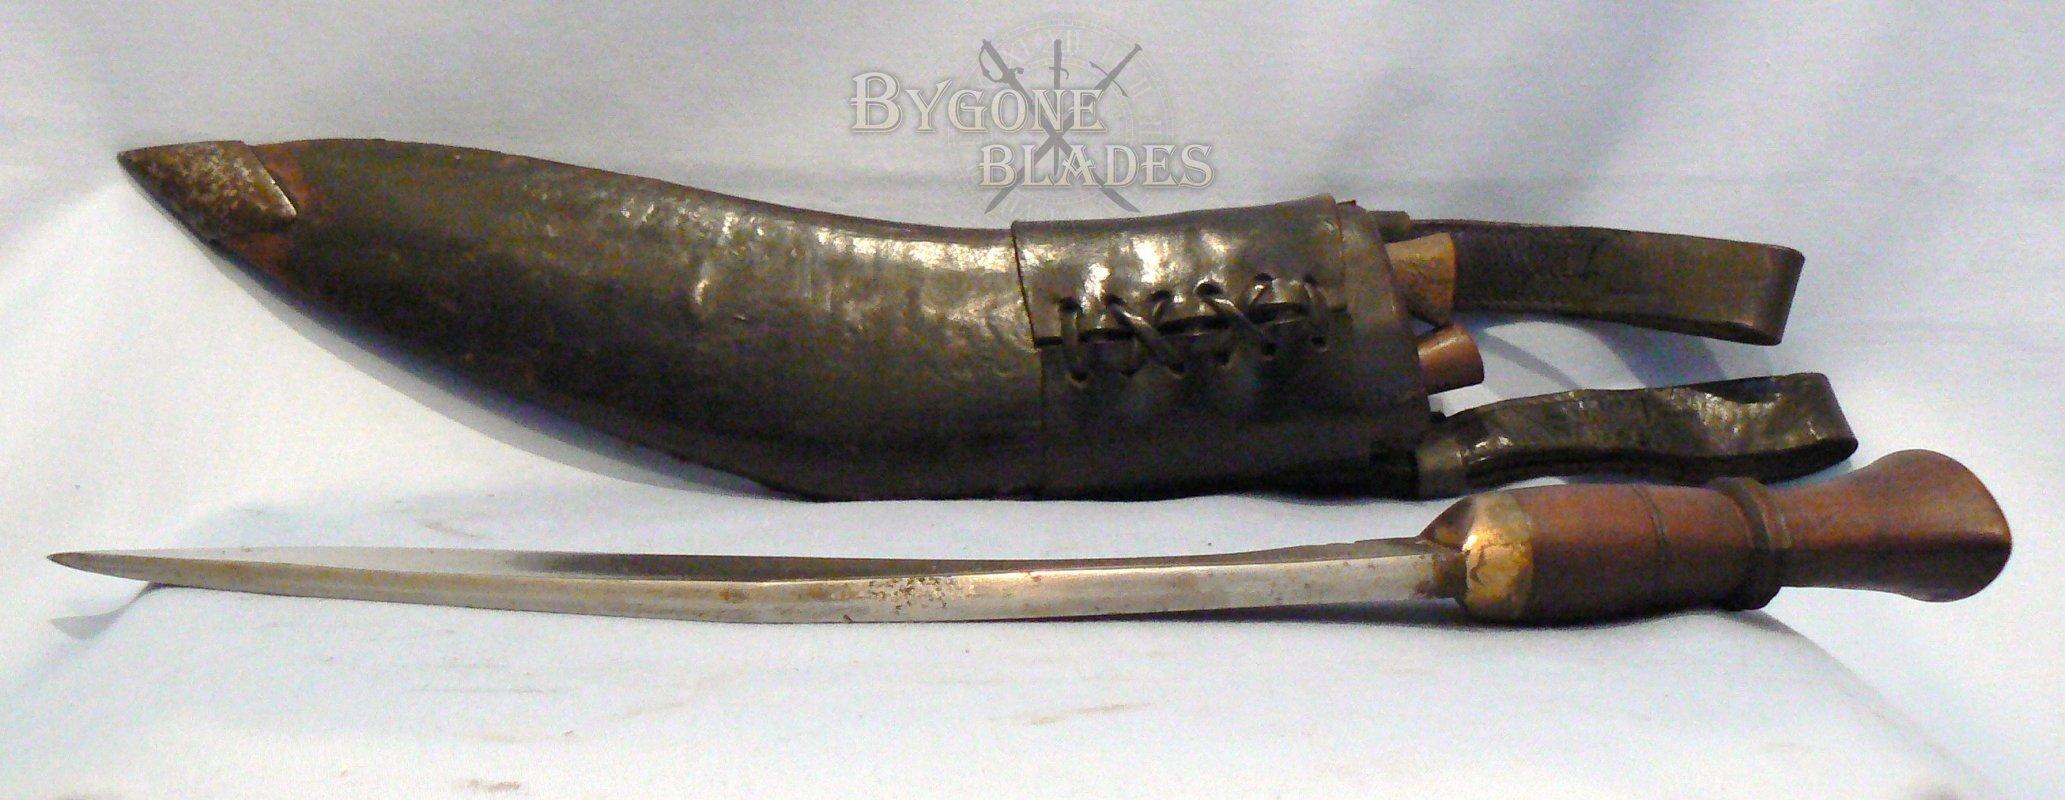 British Army Pattern Gurkha Kukri Knife Bygone Blades